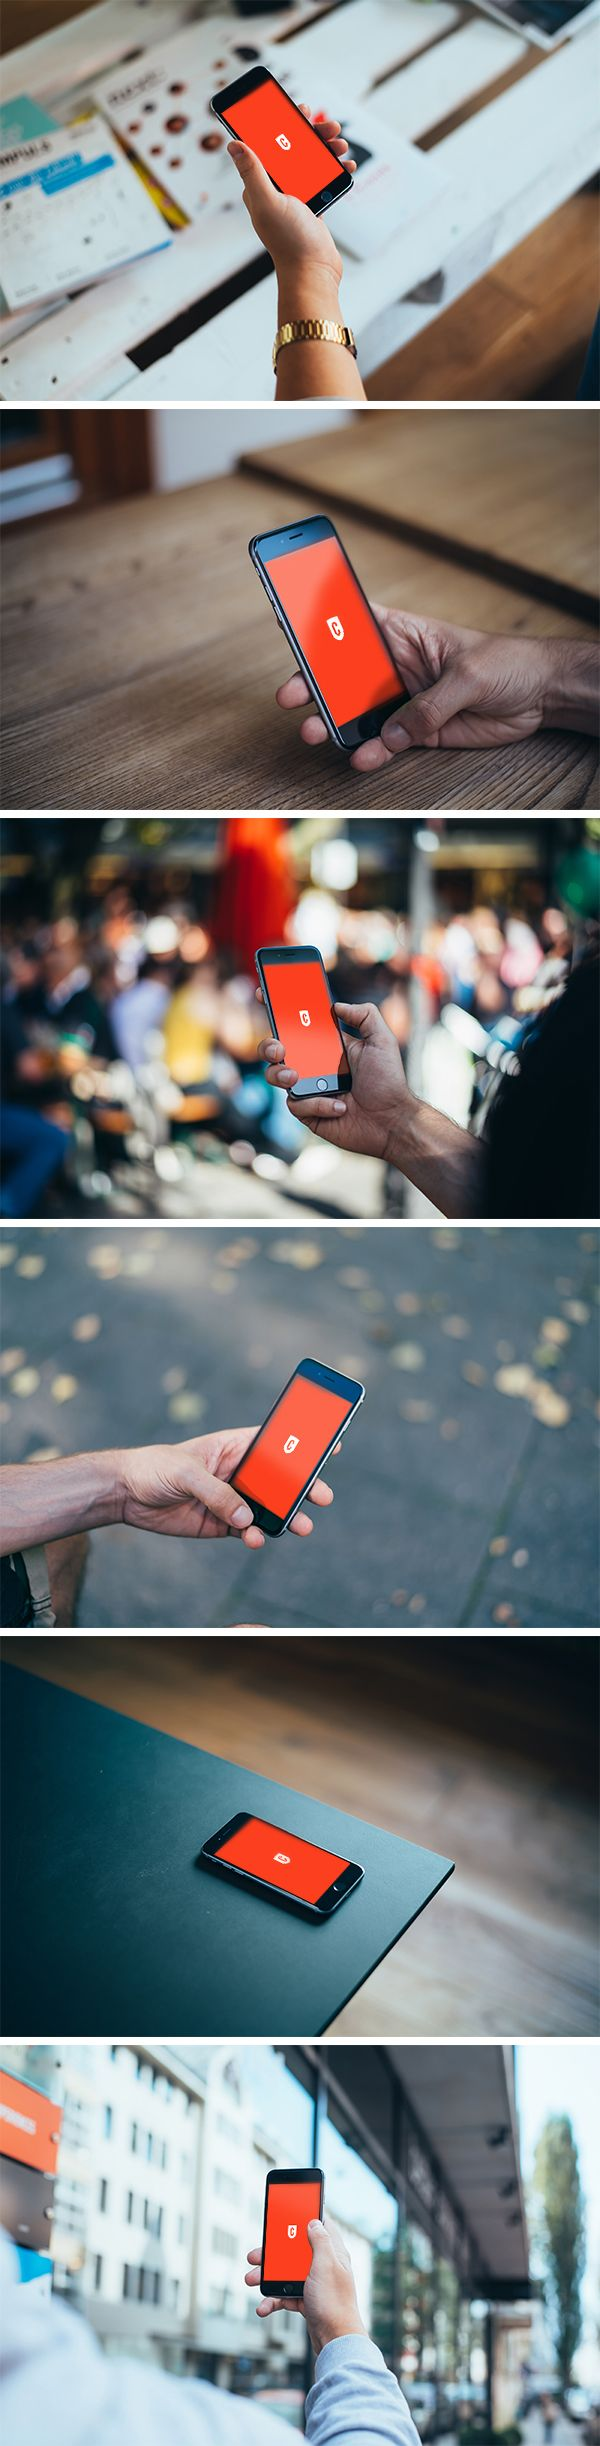 iPhone 6 Photorealistic MockUps | GraphicBurger